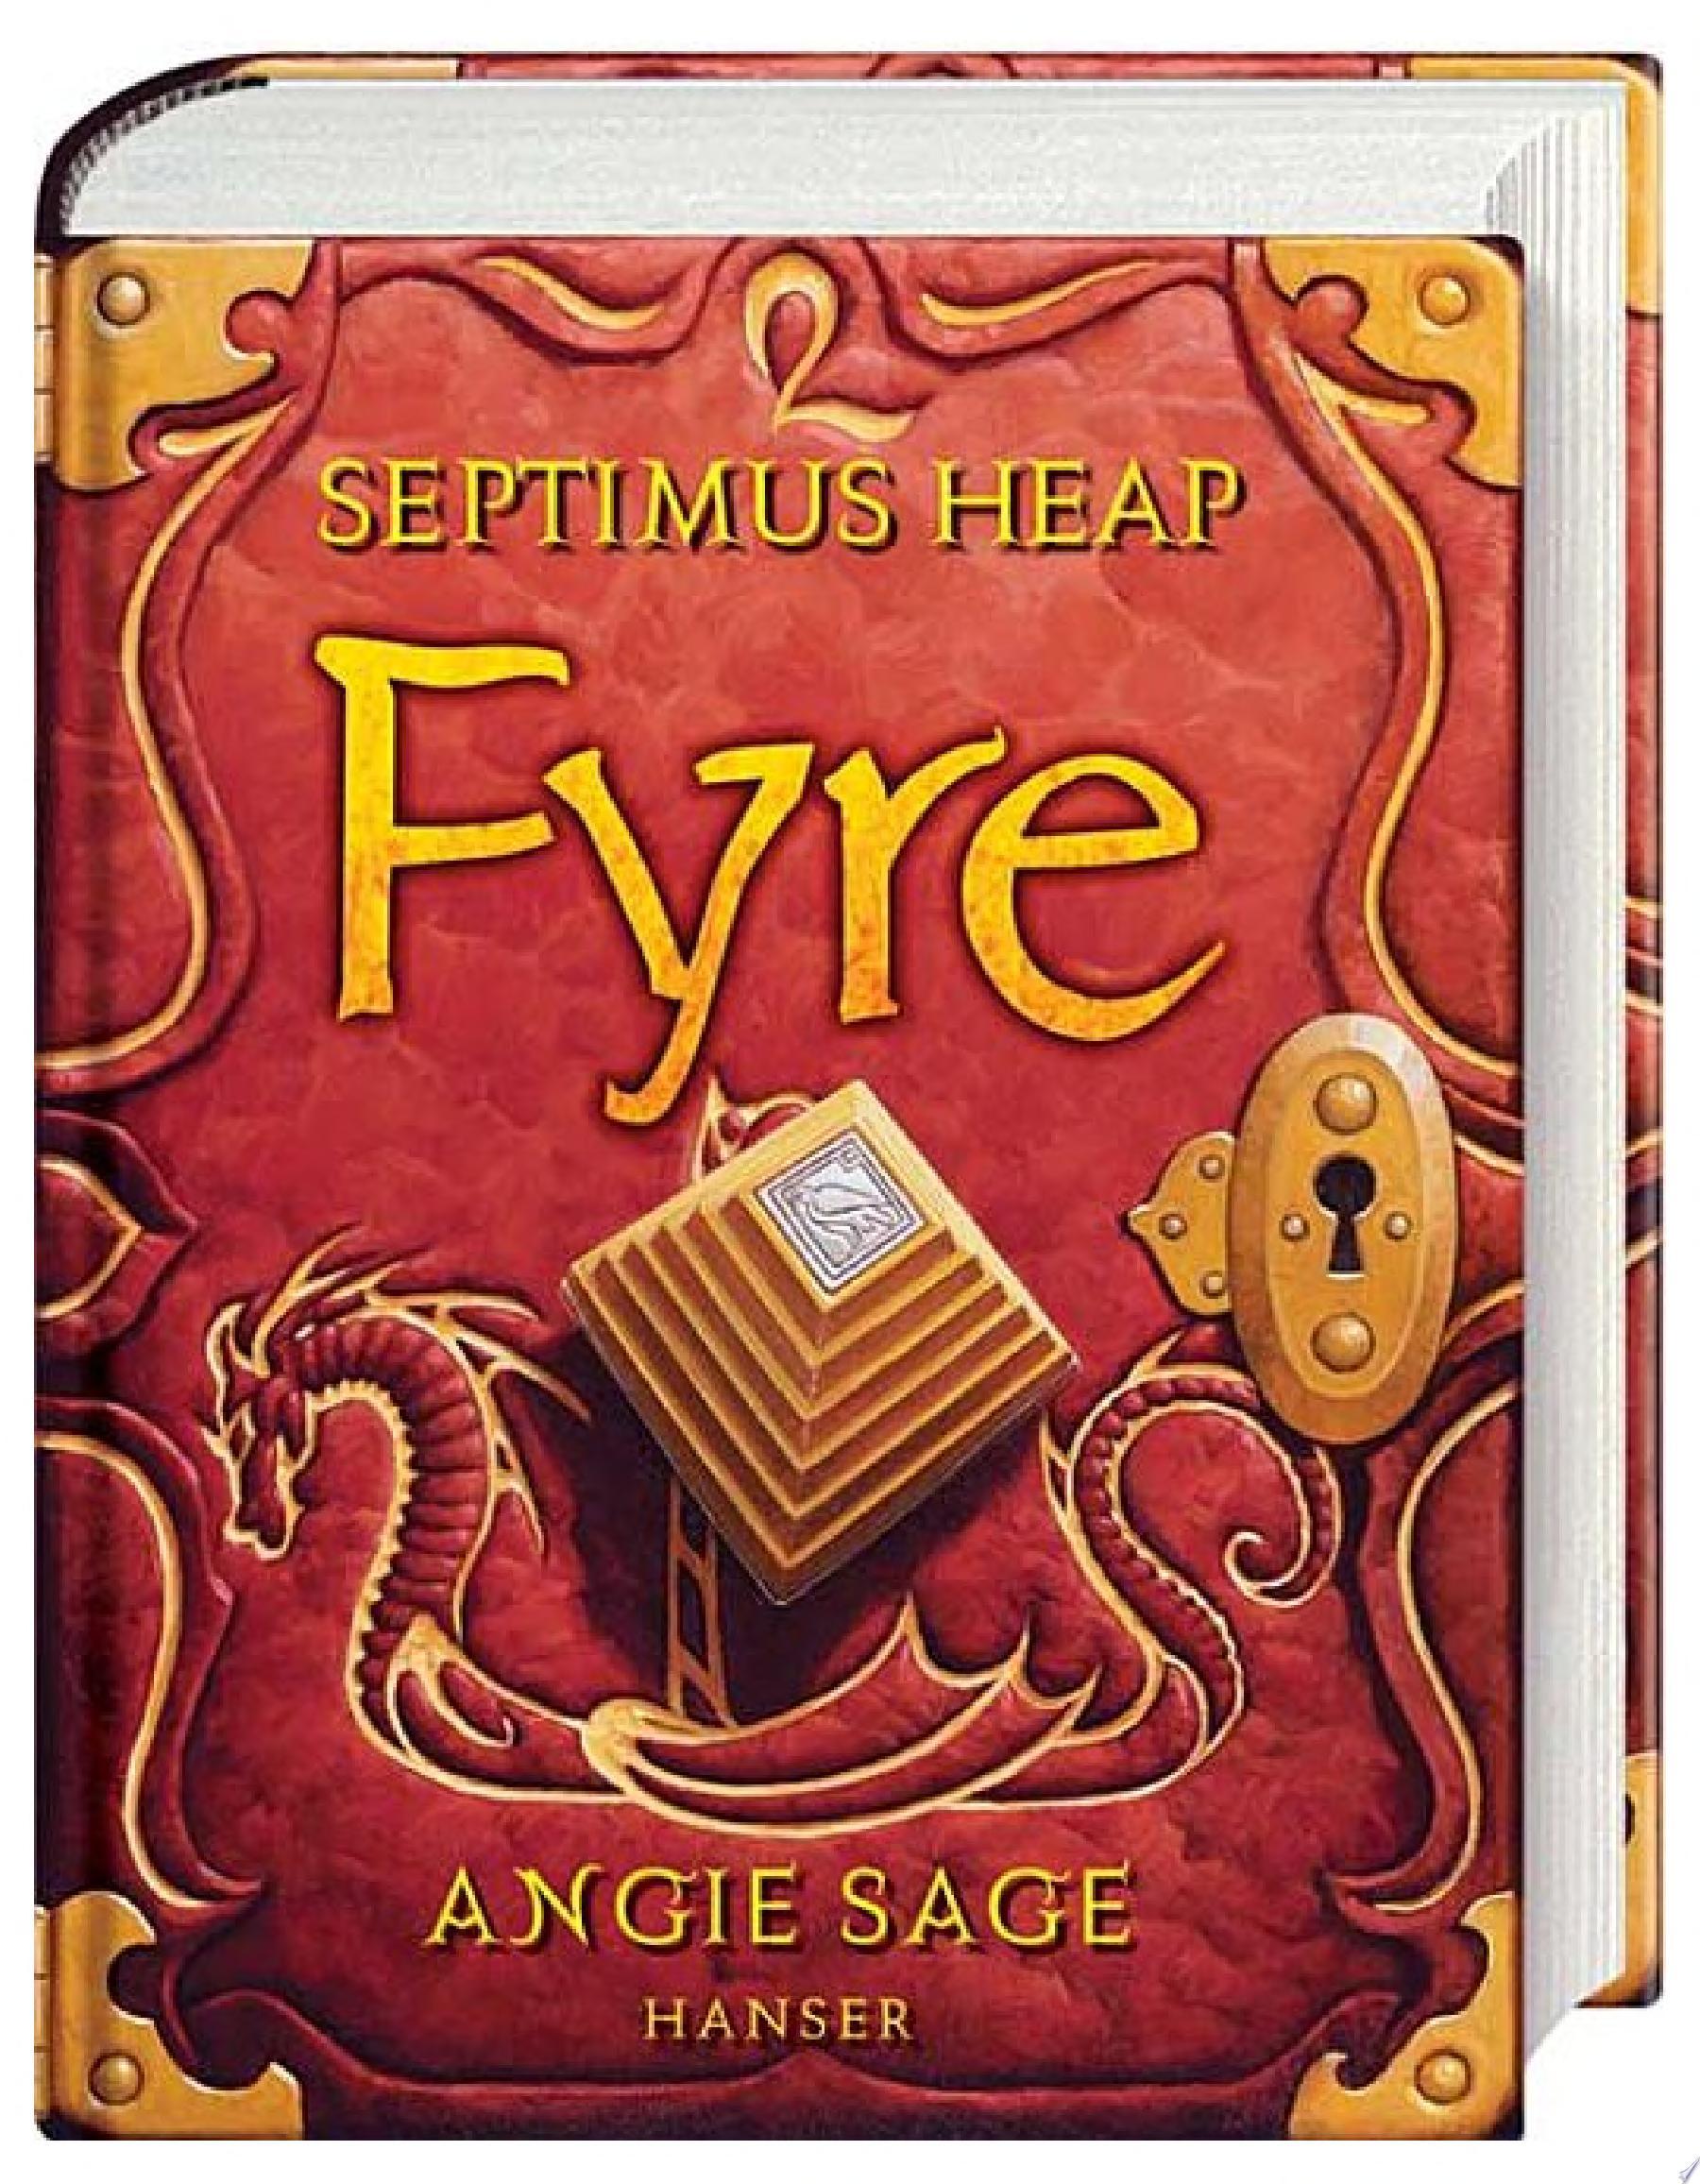 Septimus Heap   Fyre